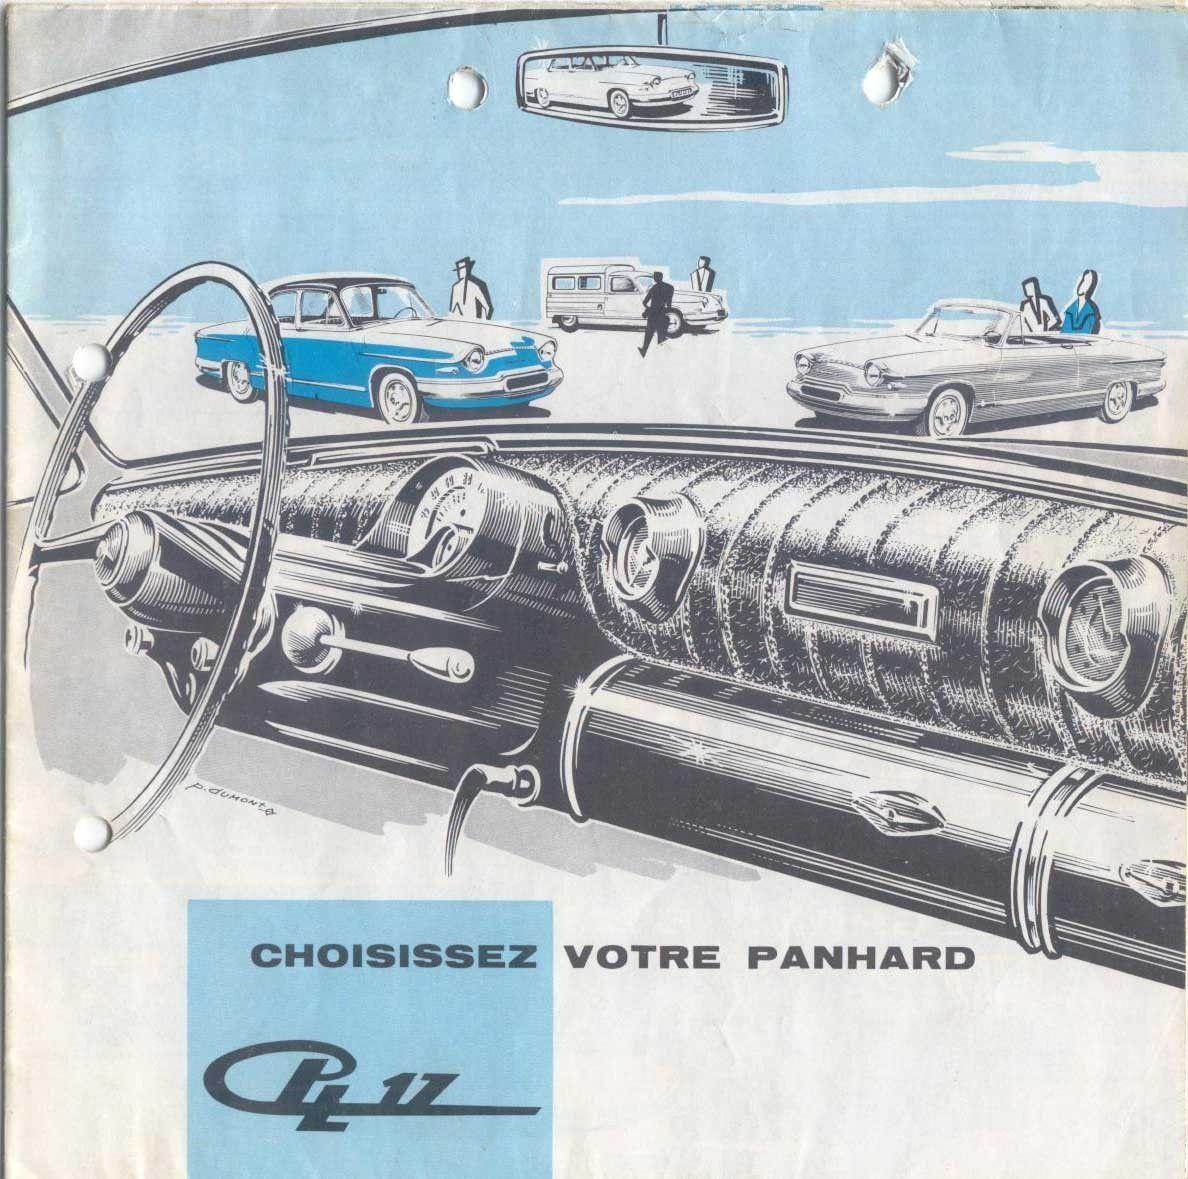 Panhard PL17 Choisissez